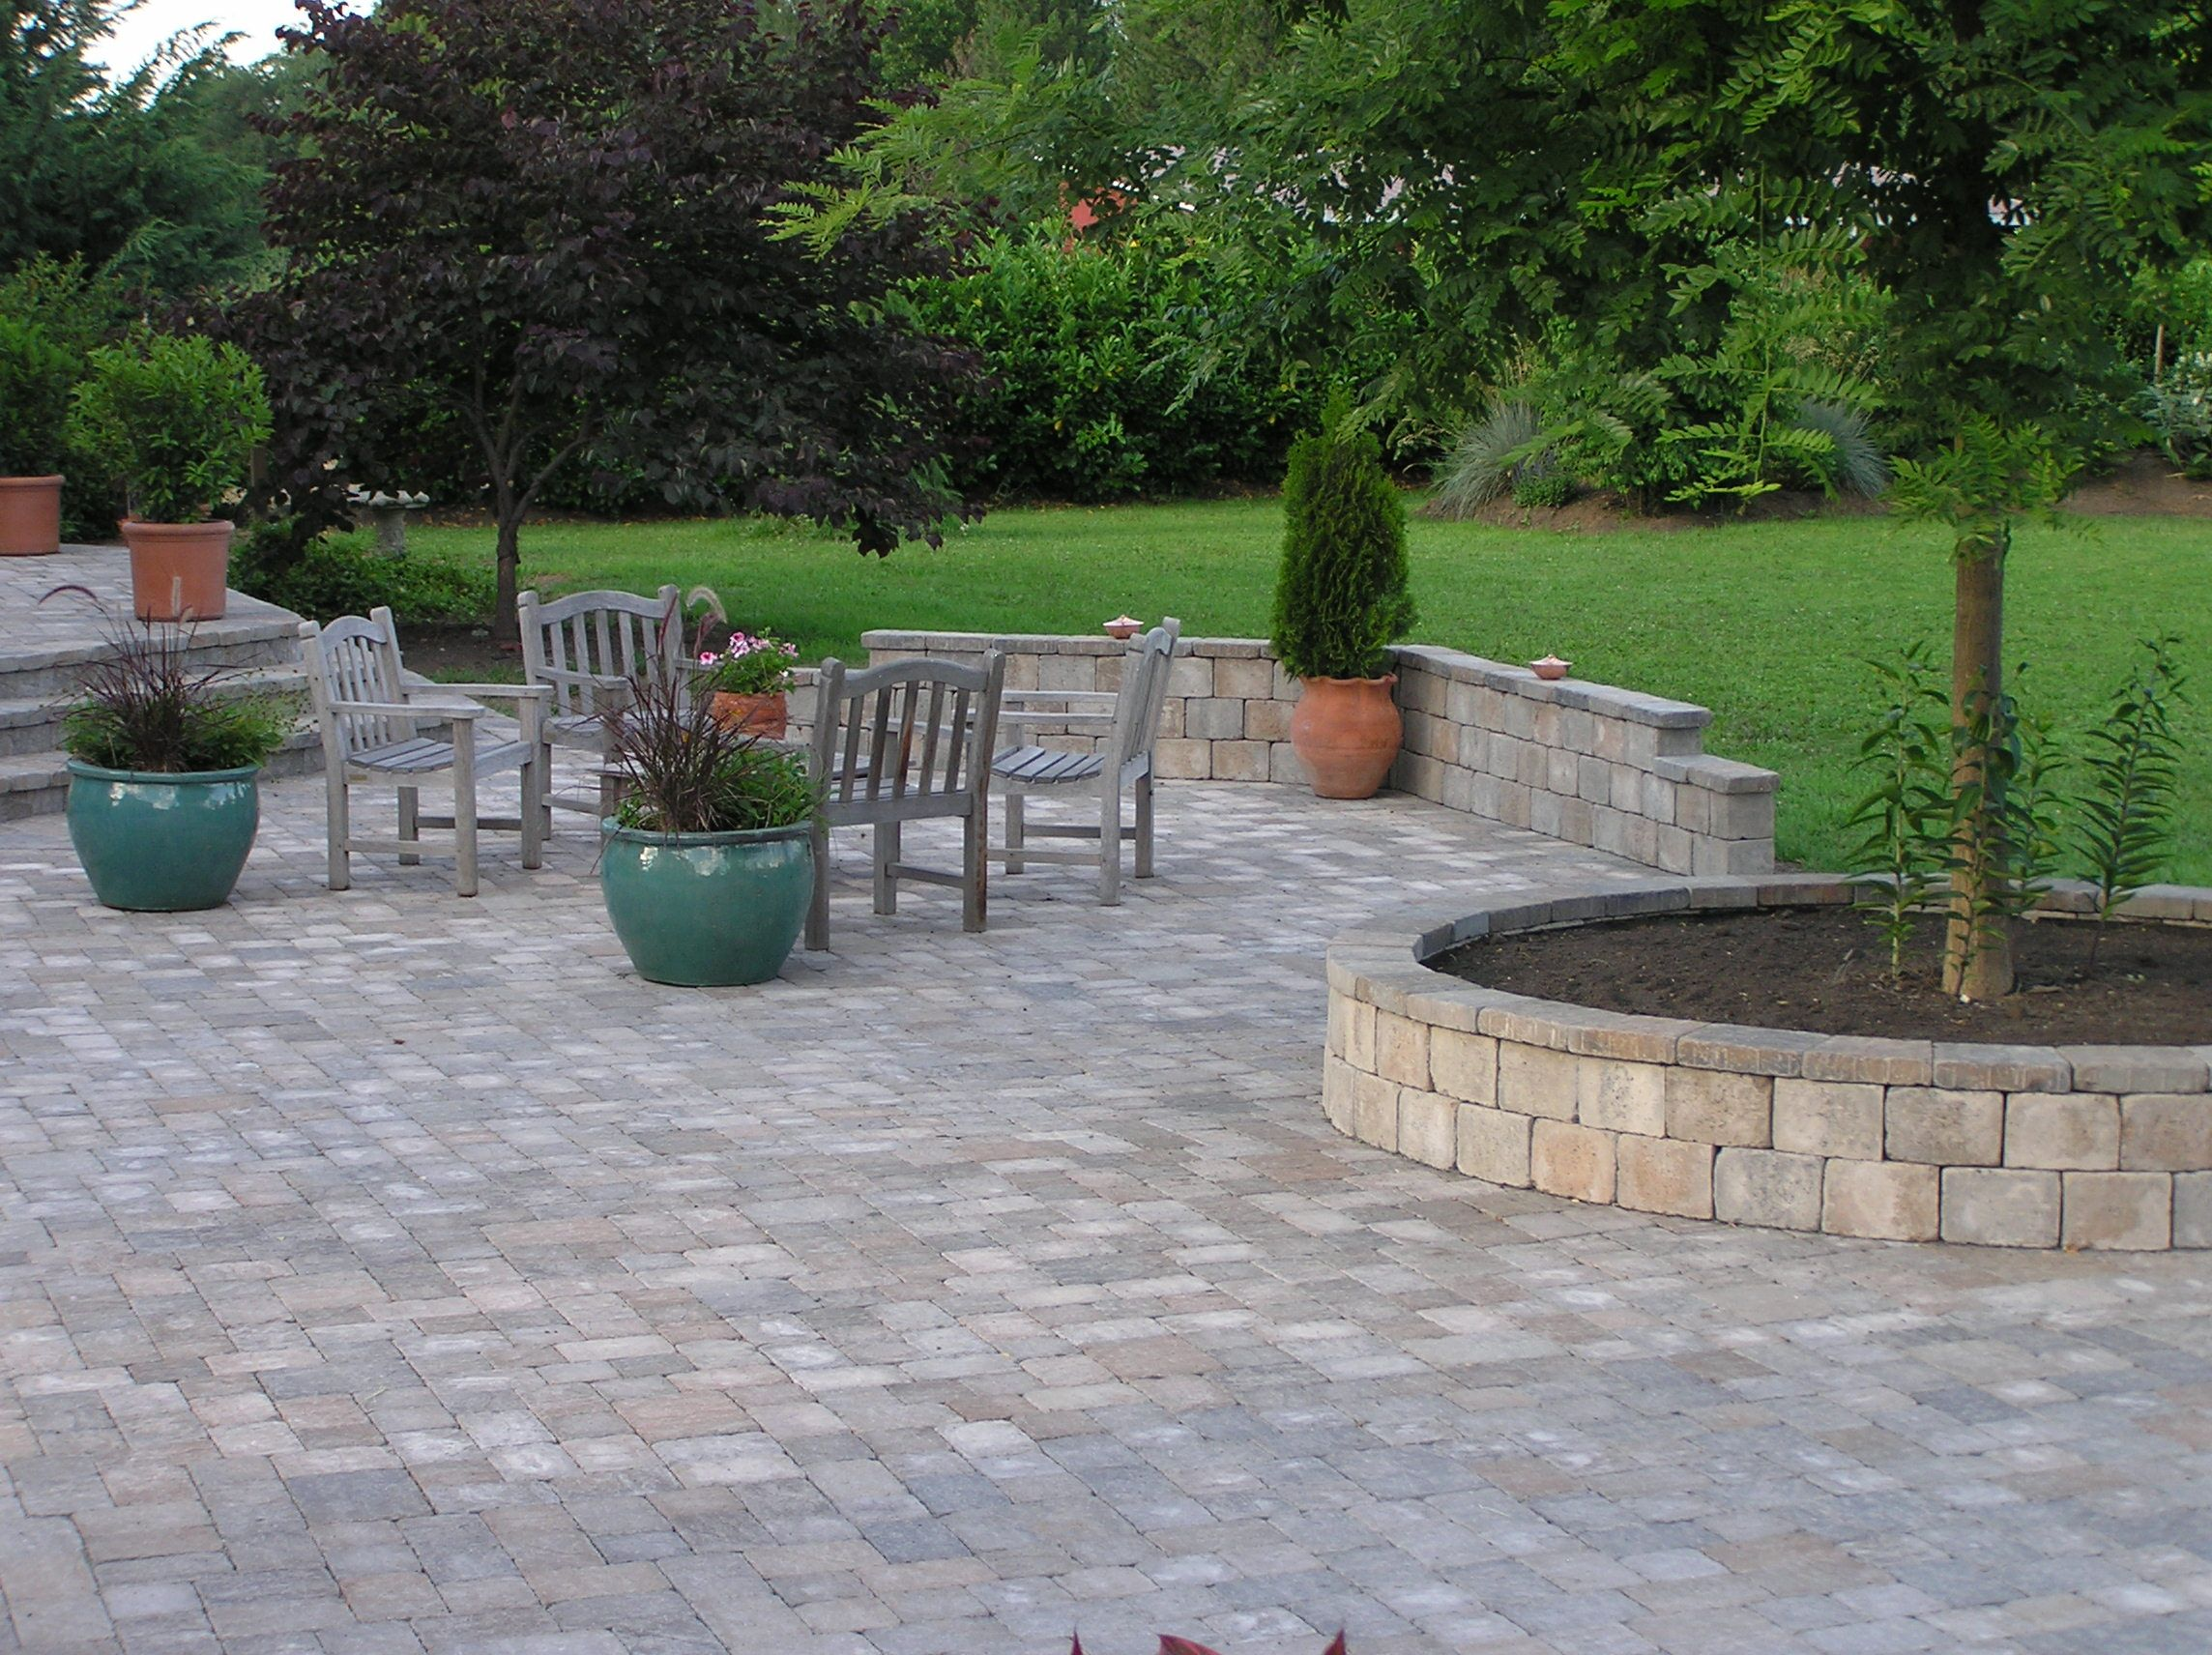 Patio U0026 Outdoor: Unique Brick Stone Paver Patterns Driveway For .